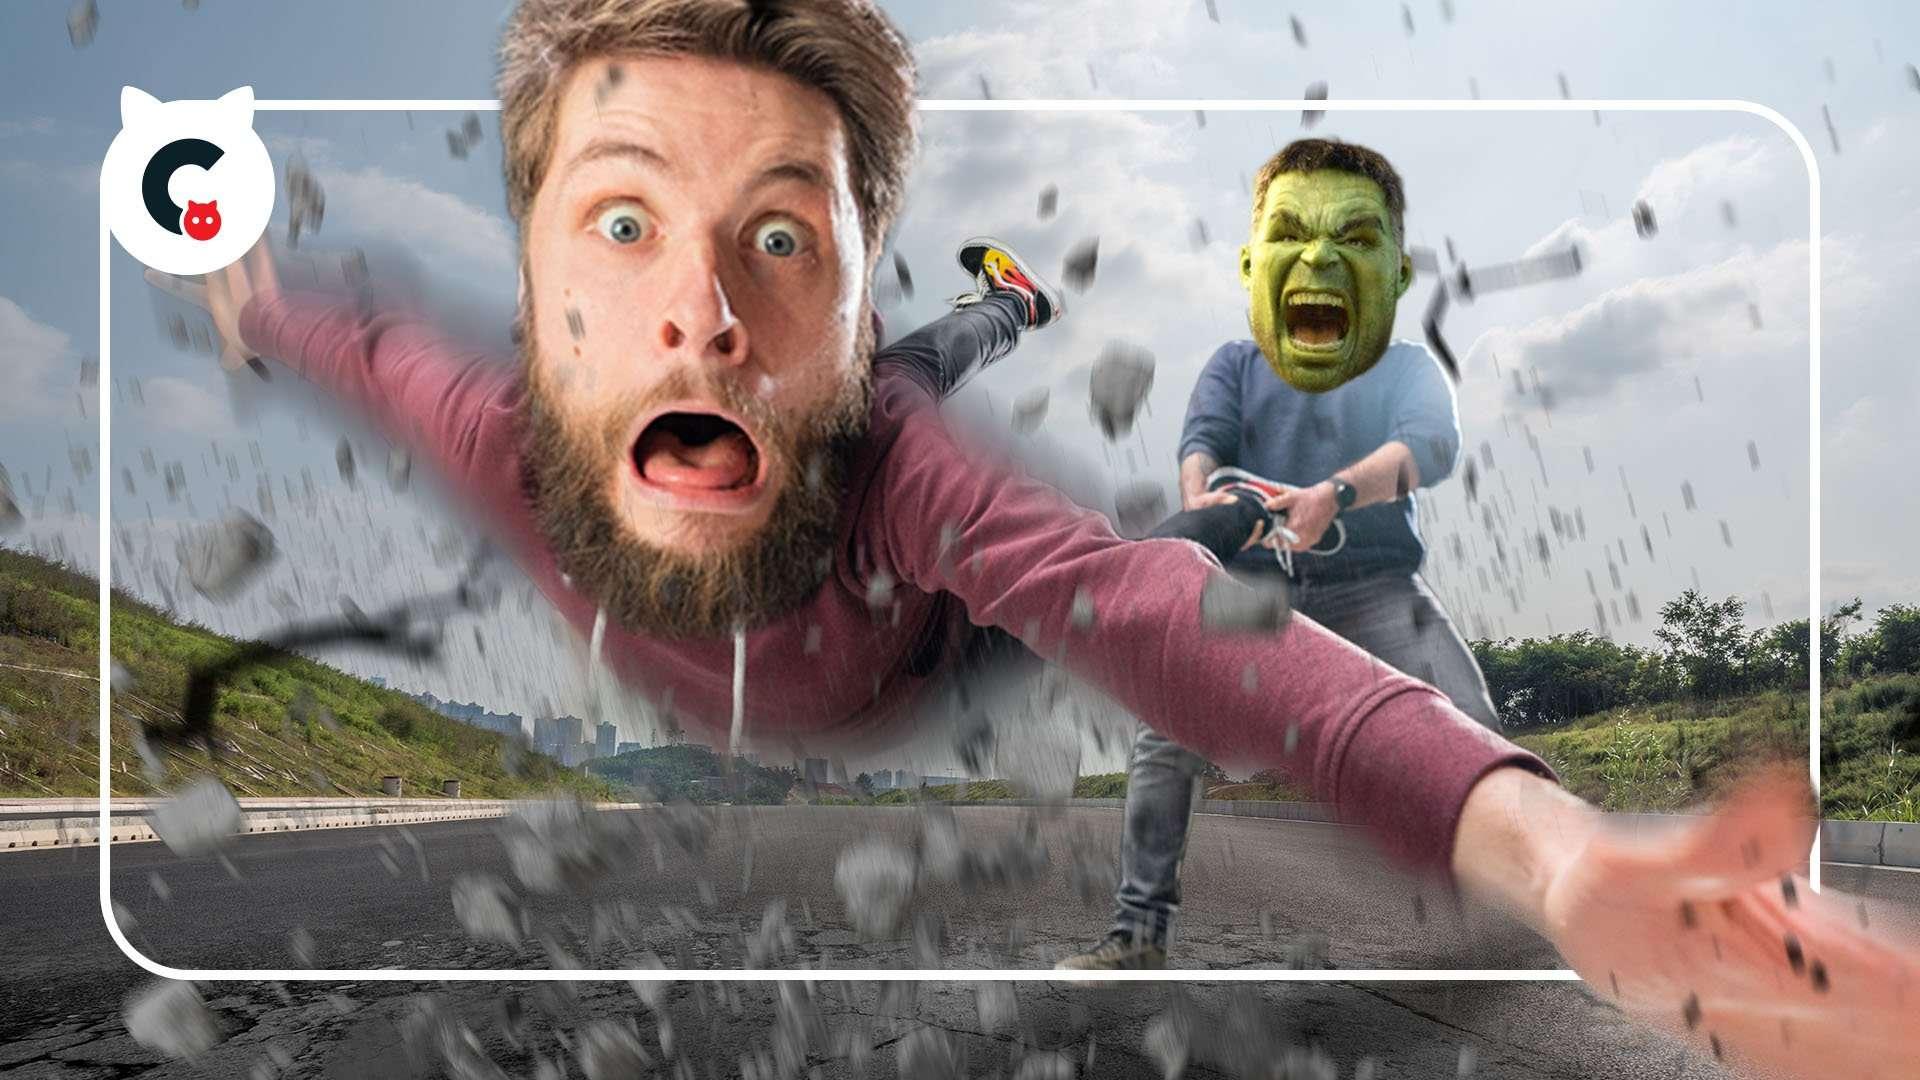 Hulk Smash with VFX CopyCat